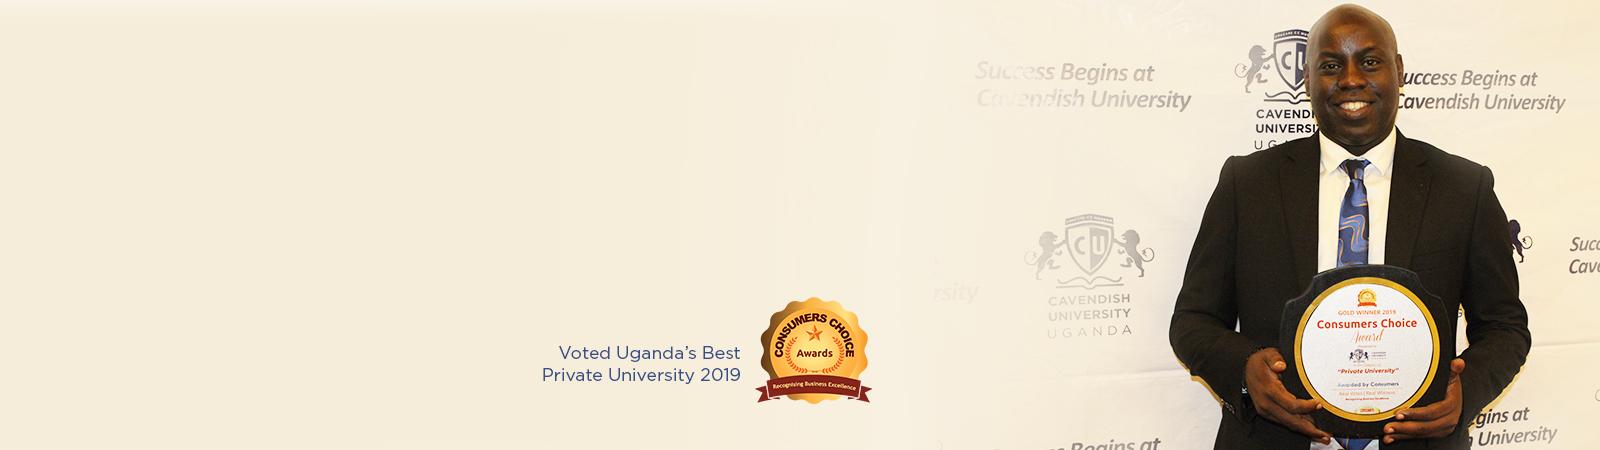 Cavendish University Uganda scoops 'Best Private University Gold Award' at the 2019 Consumers' Choice Awards Ceremony